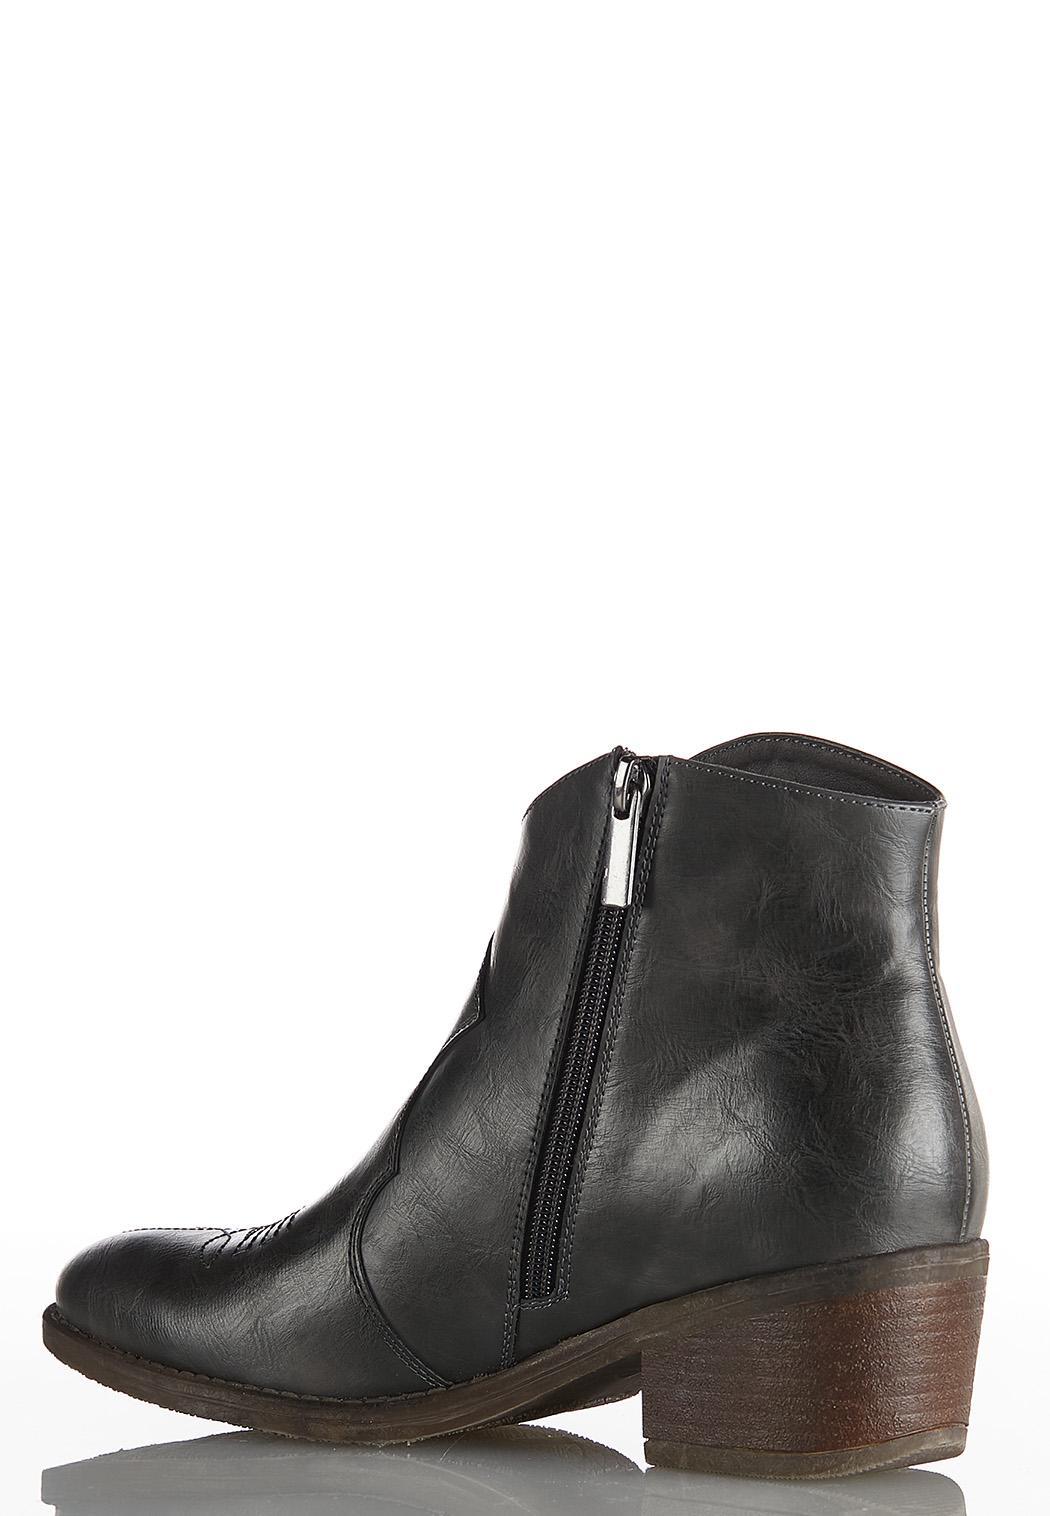 Gray Stitch Western Boots (Item #44031233)